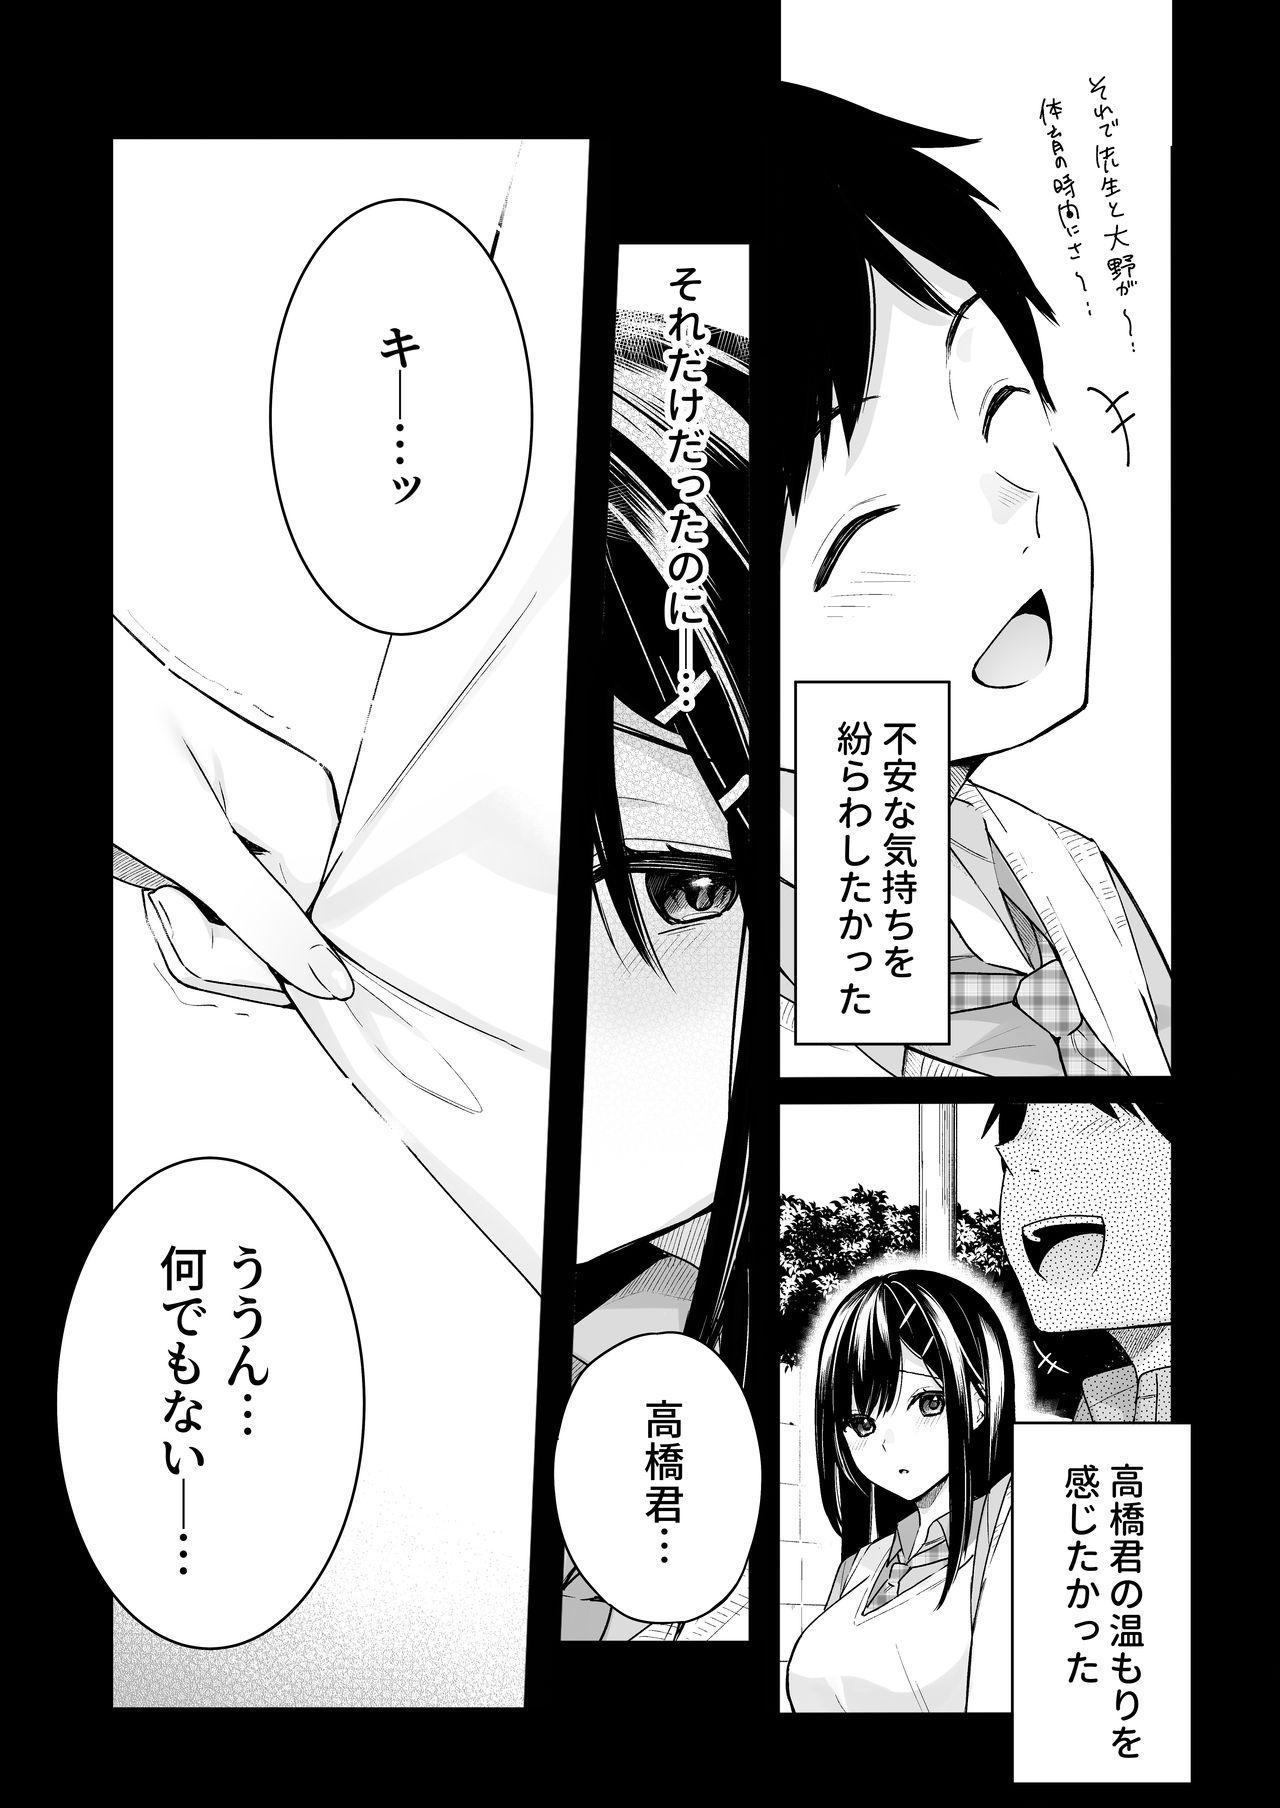 Itomusubi Vol. 4 7